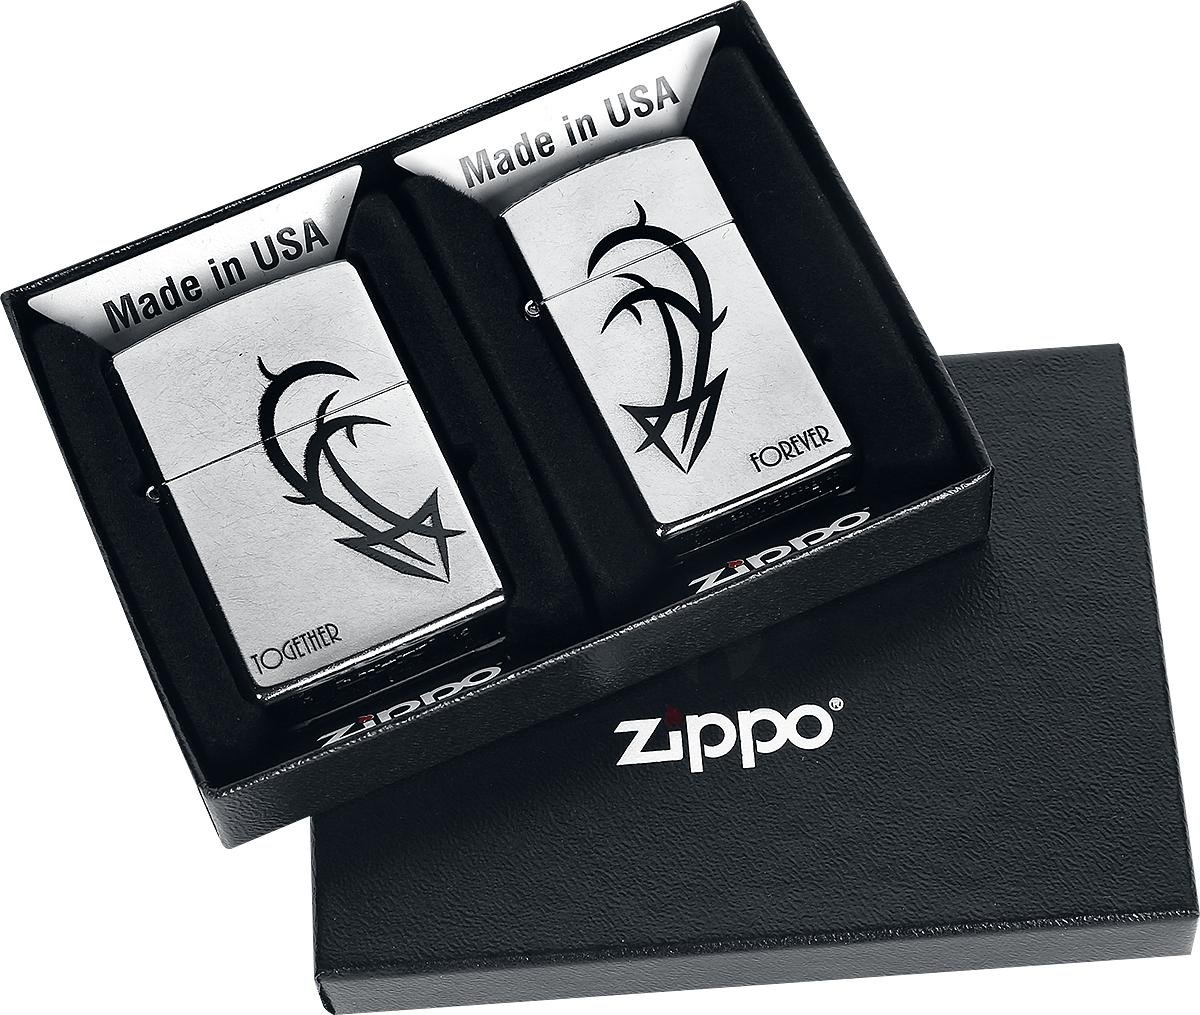 Zippo 207 1607 60001338 60001338 60001338 Plus Together Forever Benzinfeuerzeug, Messing, Street Chrom, 1 x 3,5 x 5,5 cm 71d0b0